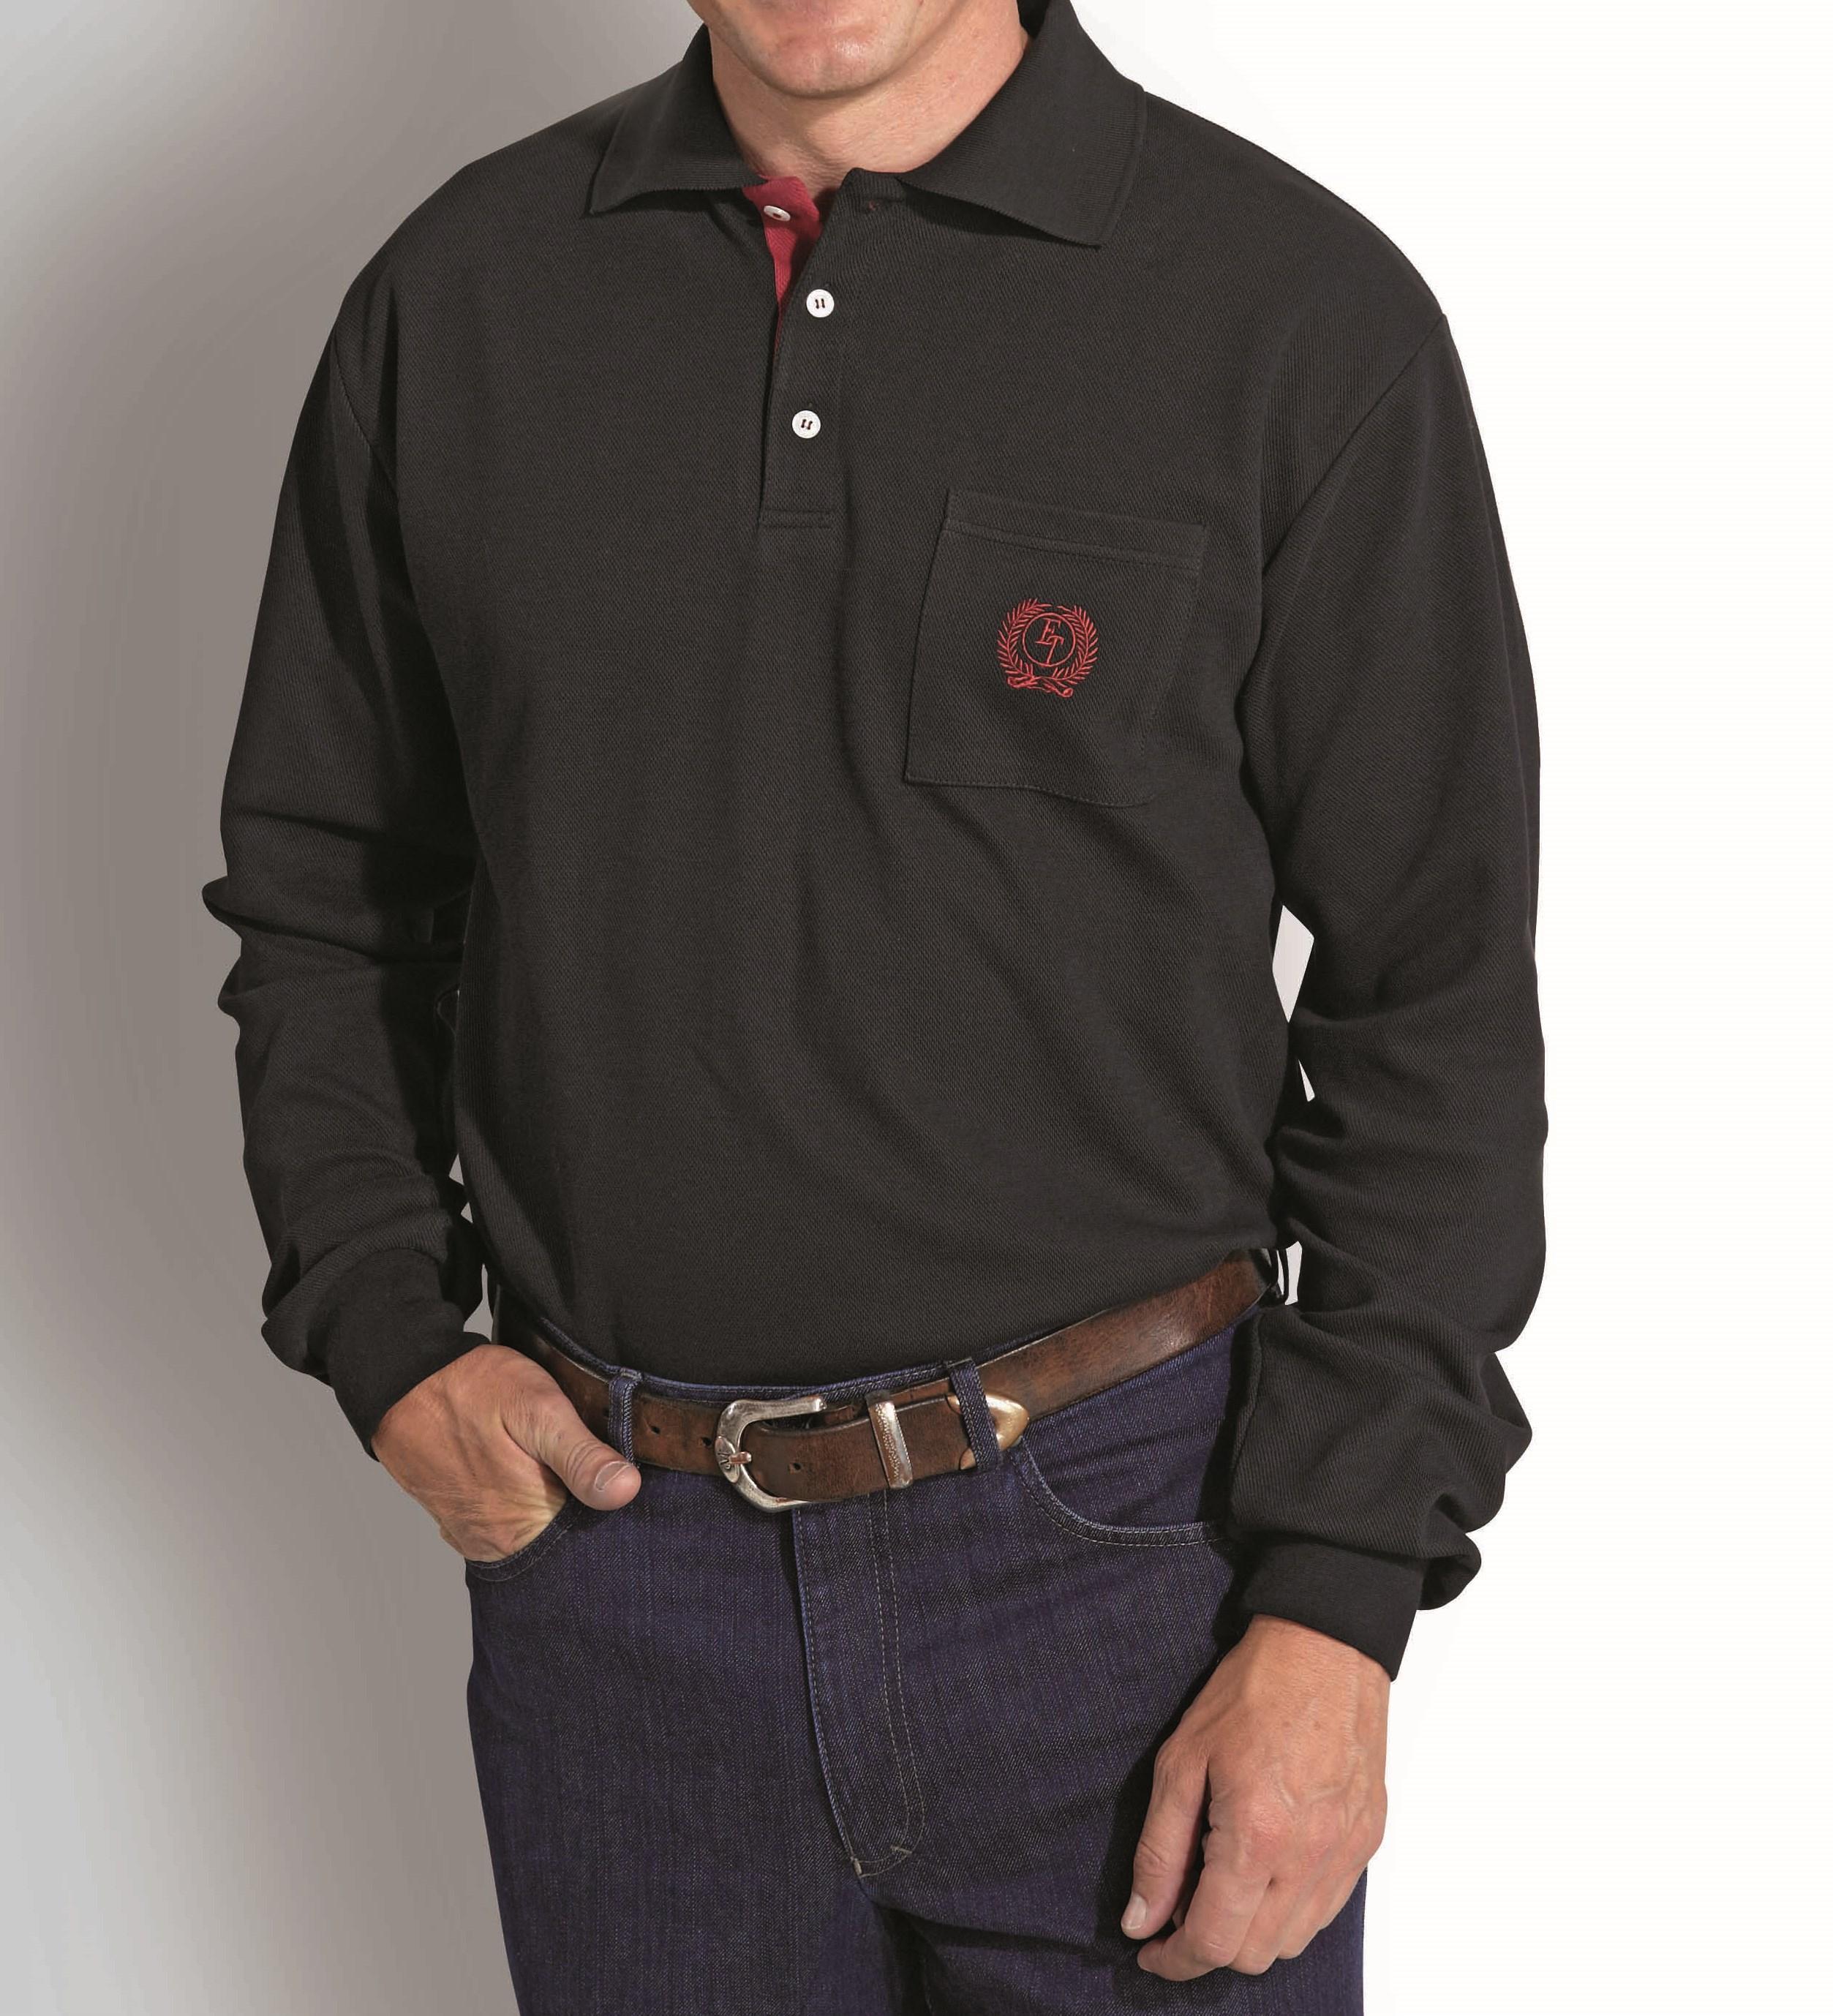 herren langarmshirt polo shirt langarm poloshirt schwarz u. Black Bedroom Furniture Sets. Home Design Ideas